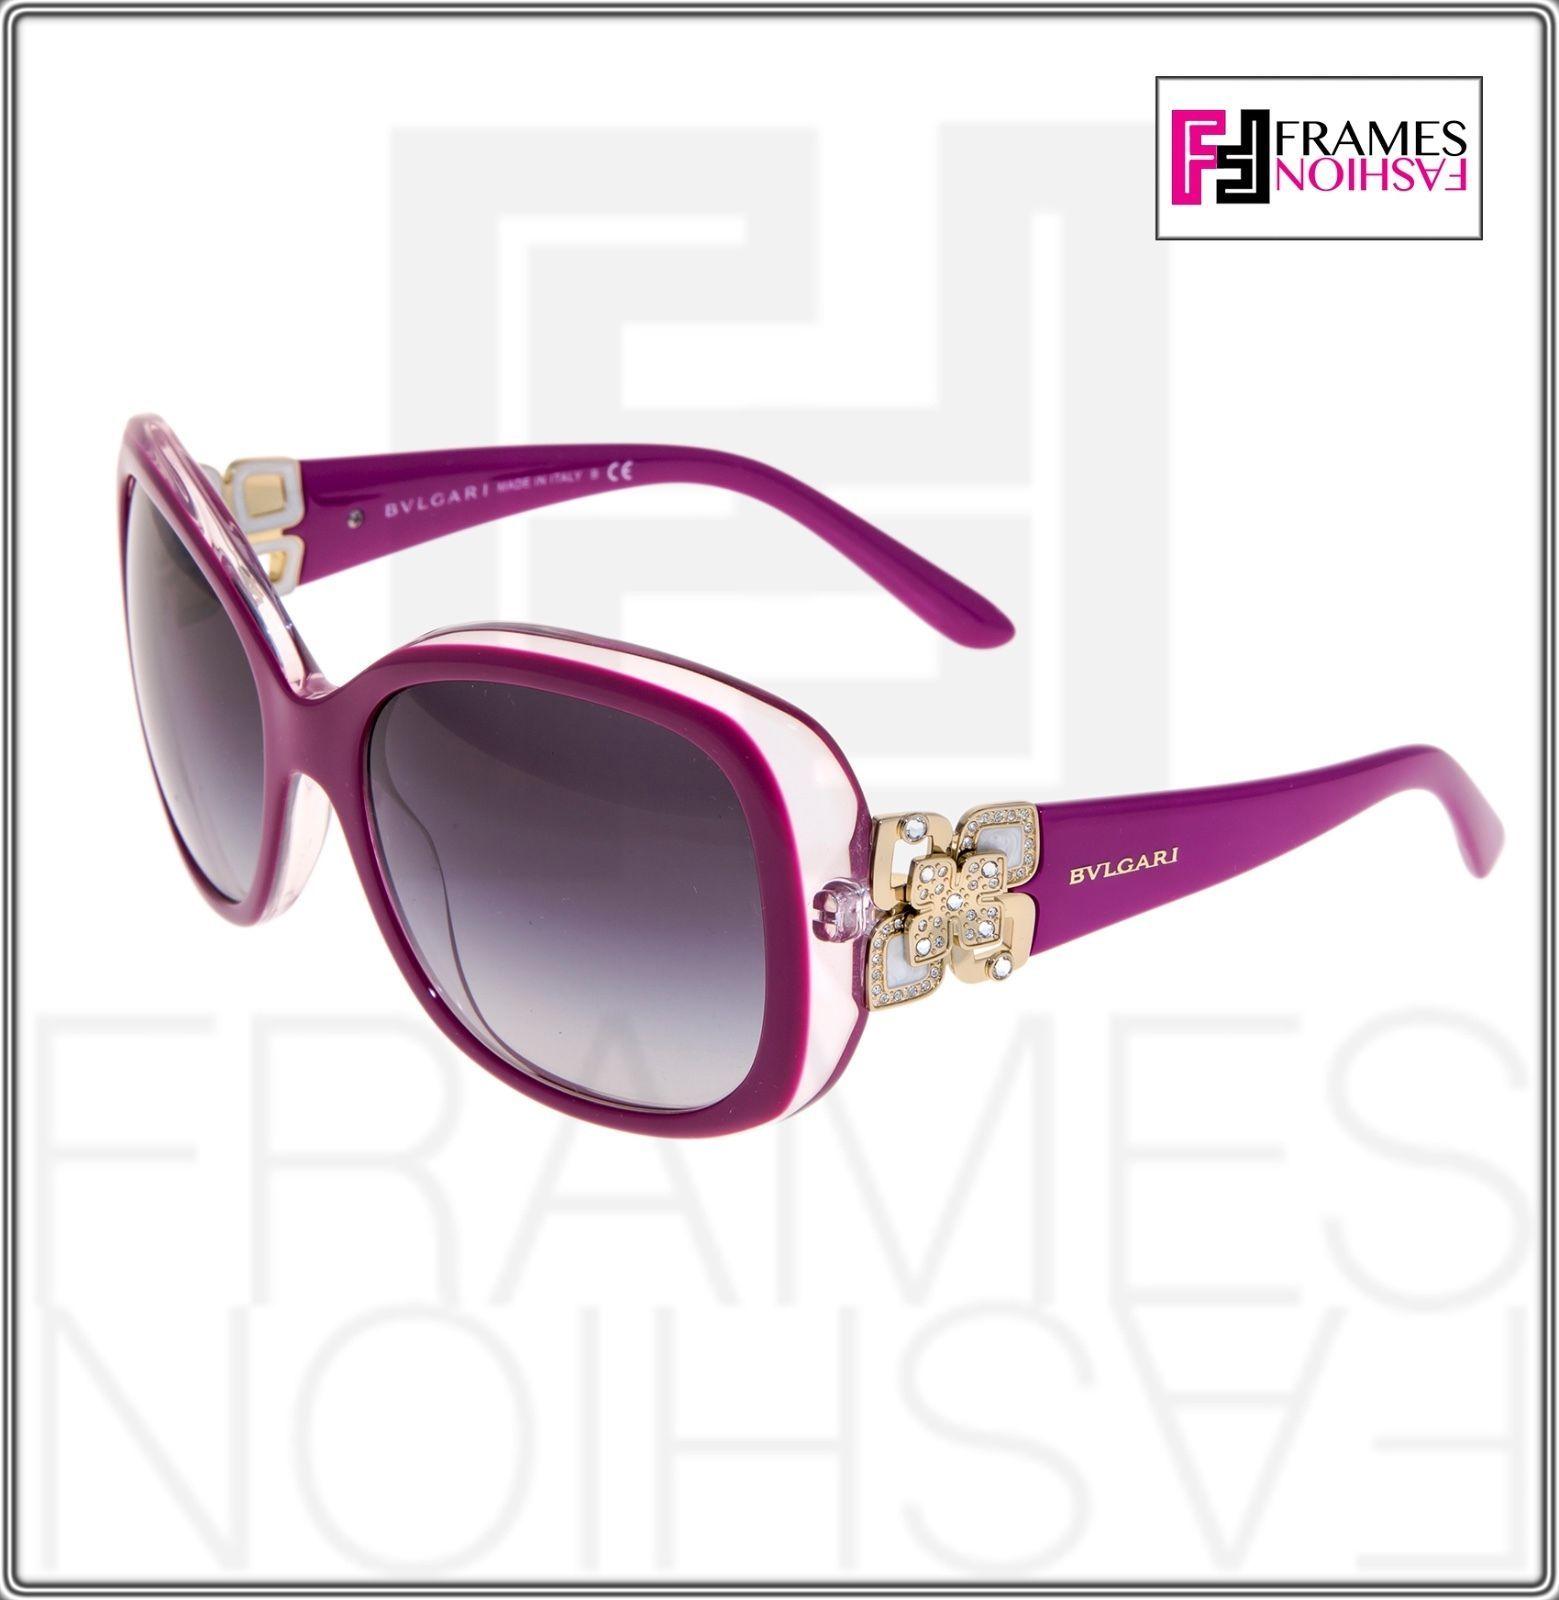 BVLGARI GIARDINI ITALIANI 8172B Pink Fuchsia Gold Square Flower Sunglasses 8172